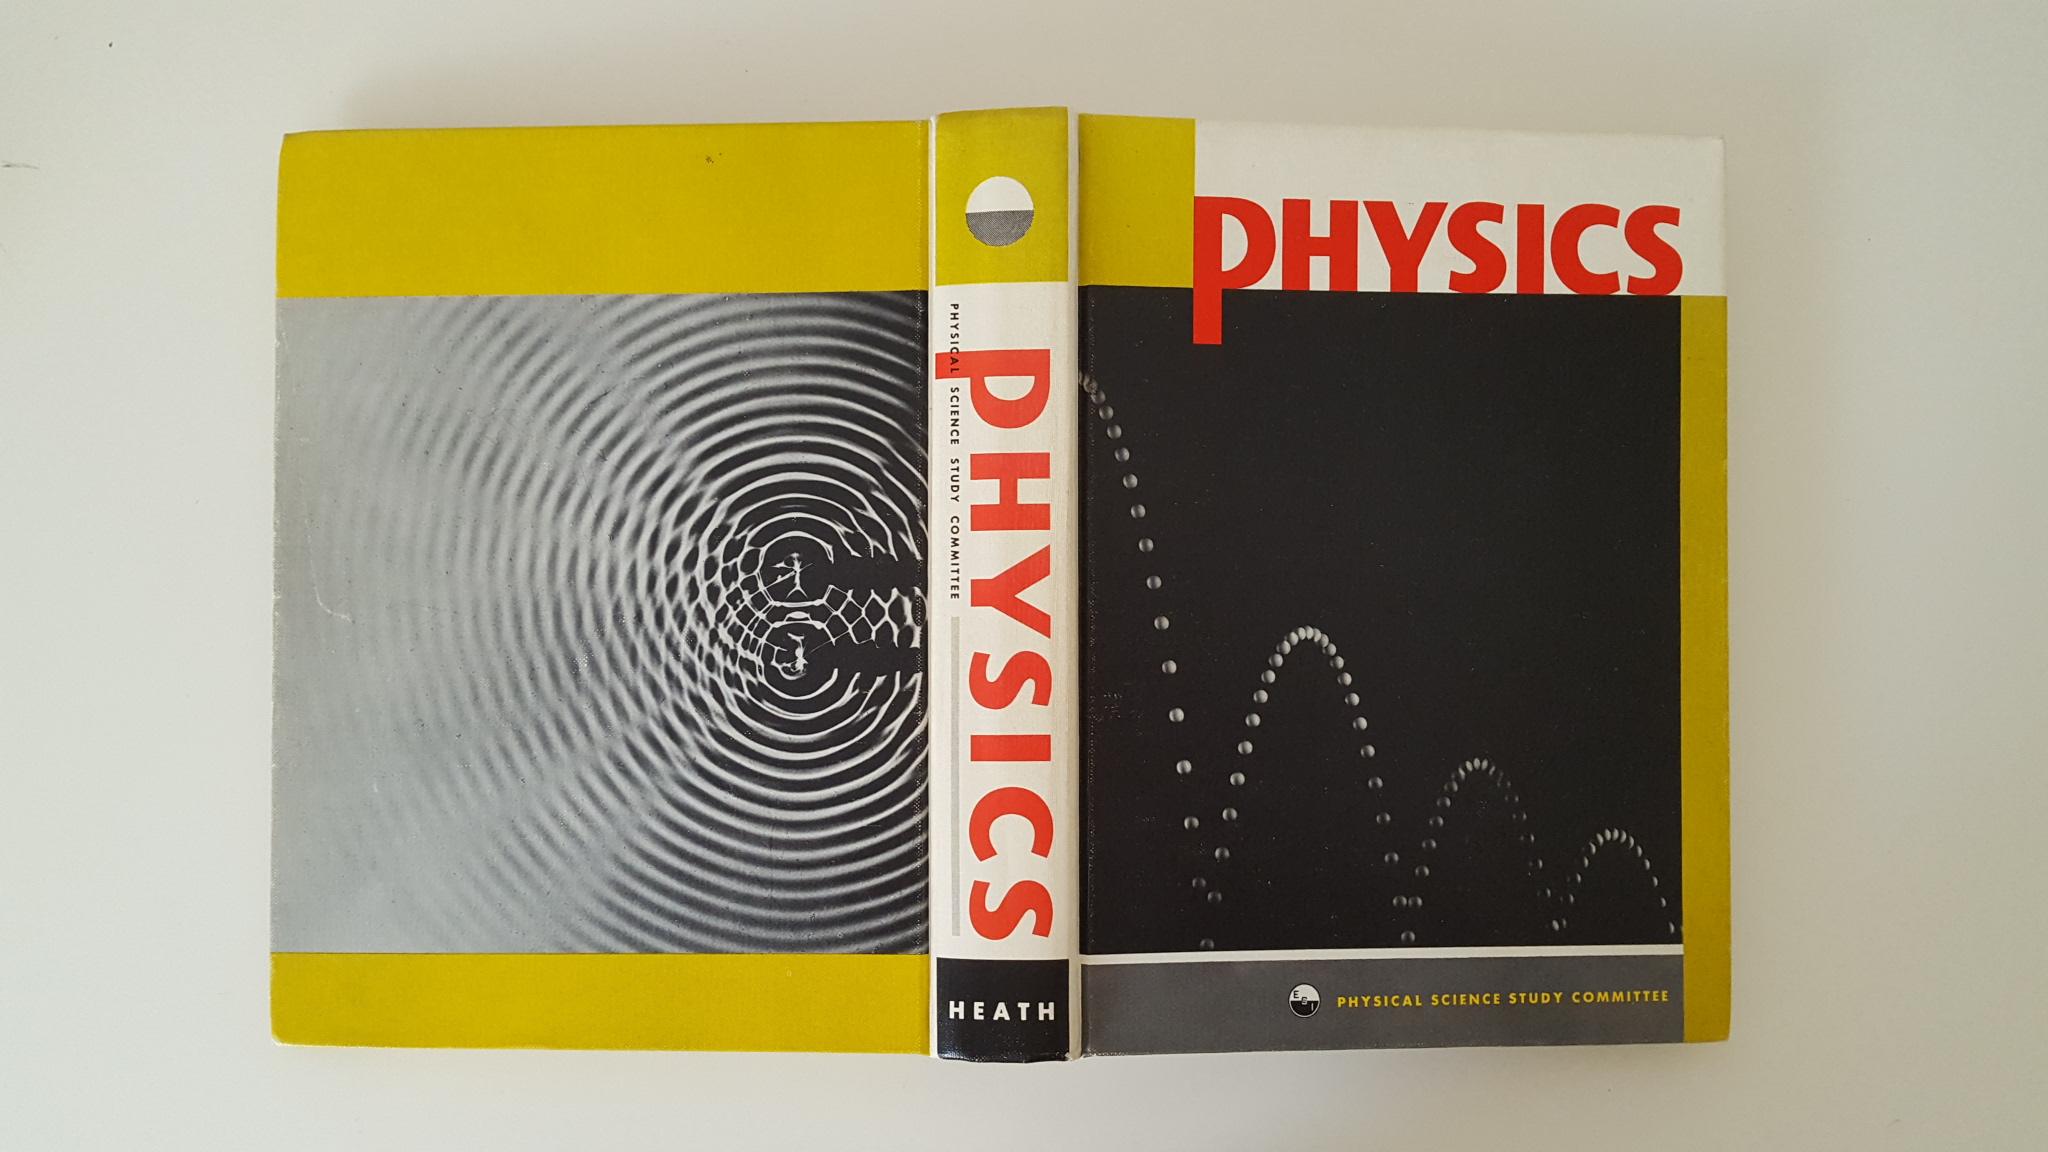 09_fizika_tankonyv_abbott_fotoival_a_boriton_1960.jpg